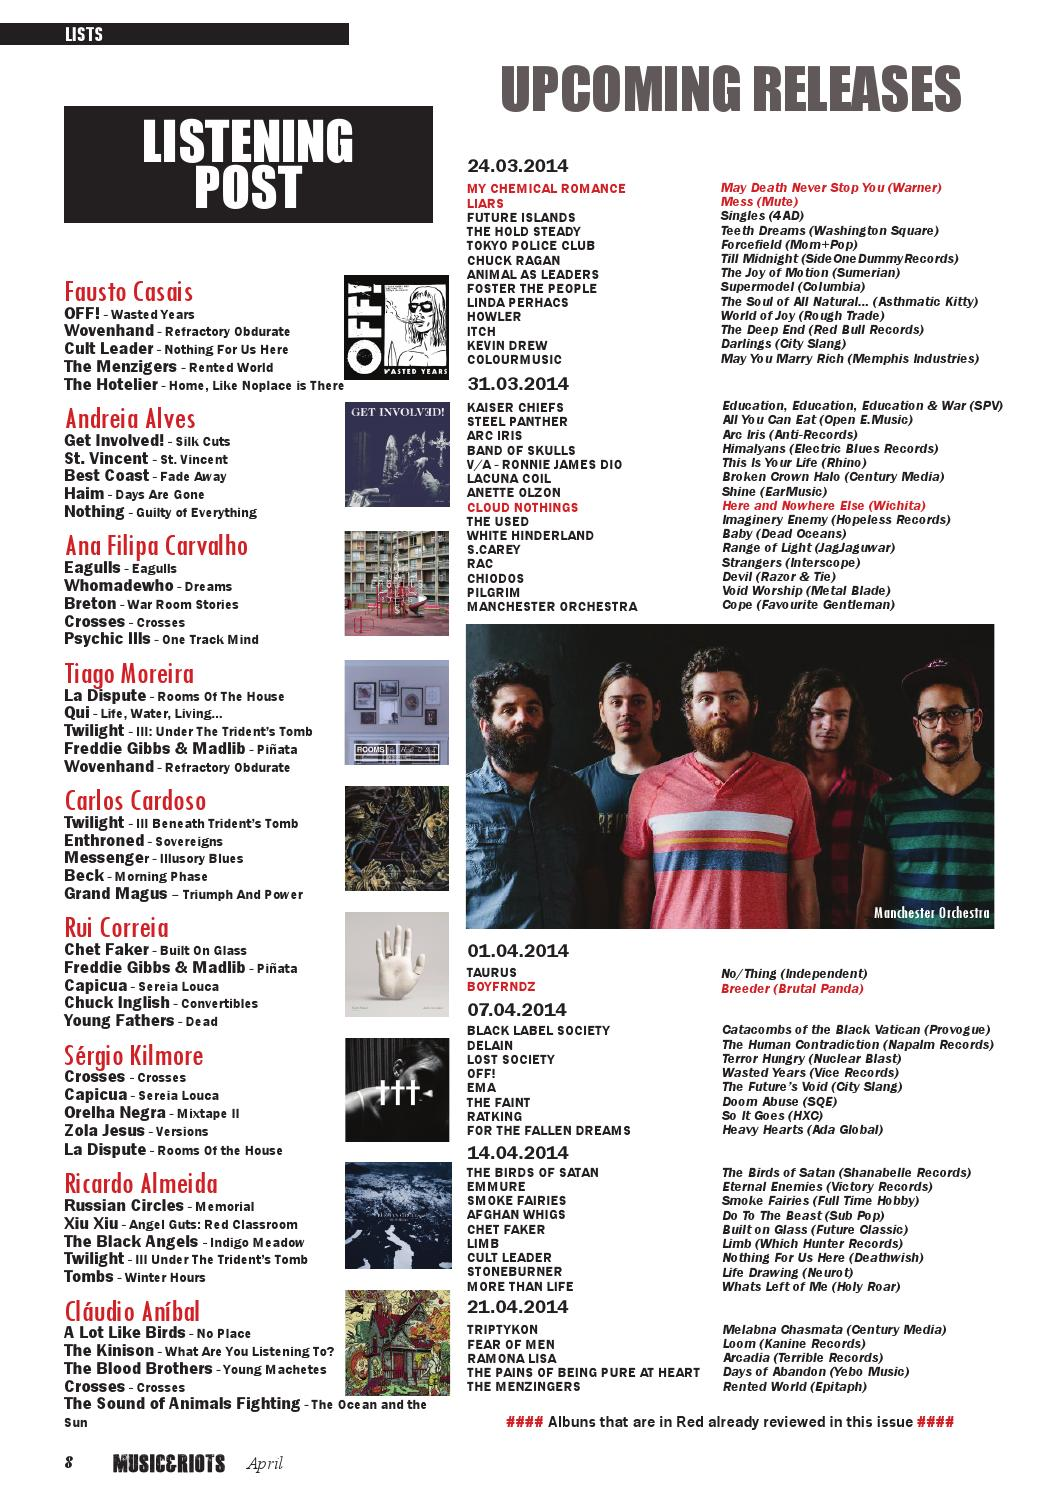 MUSIC&RIOTS Magazine 01 by MUSIC&RIOTS Magazine - issuu